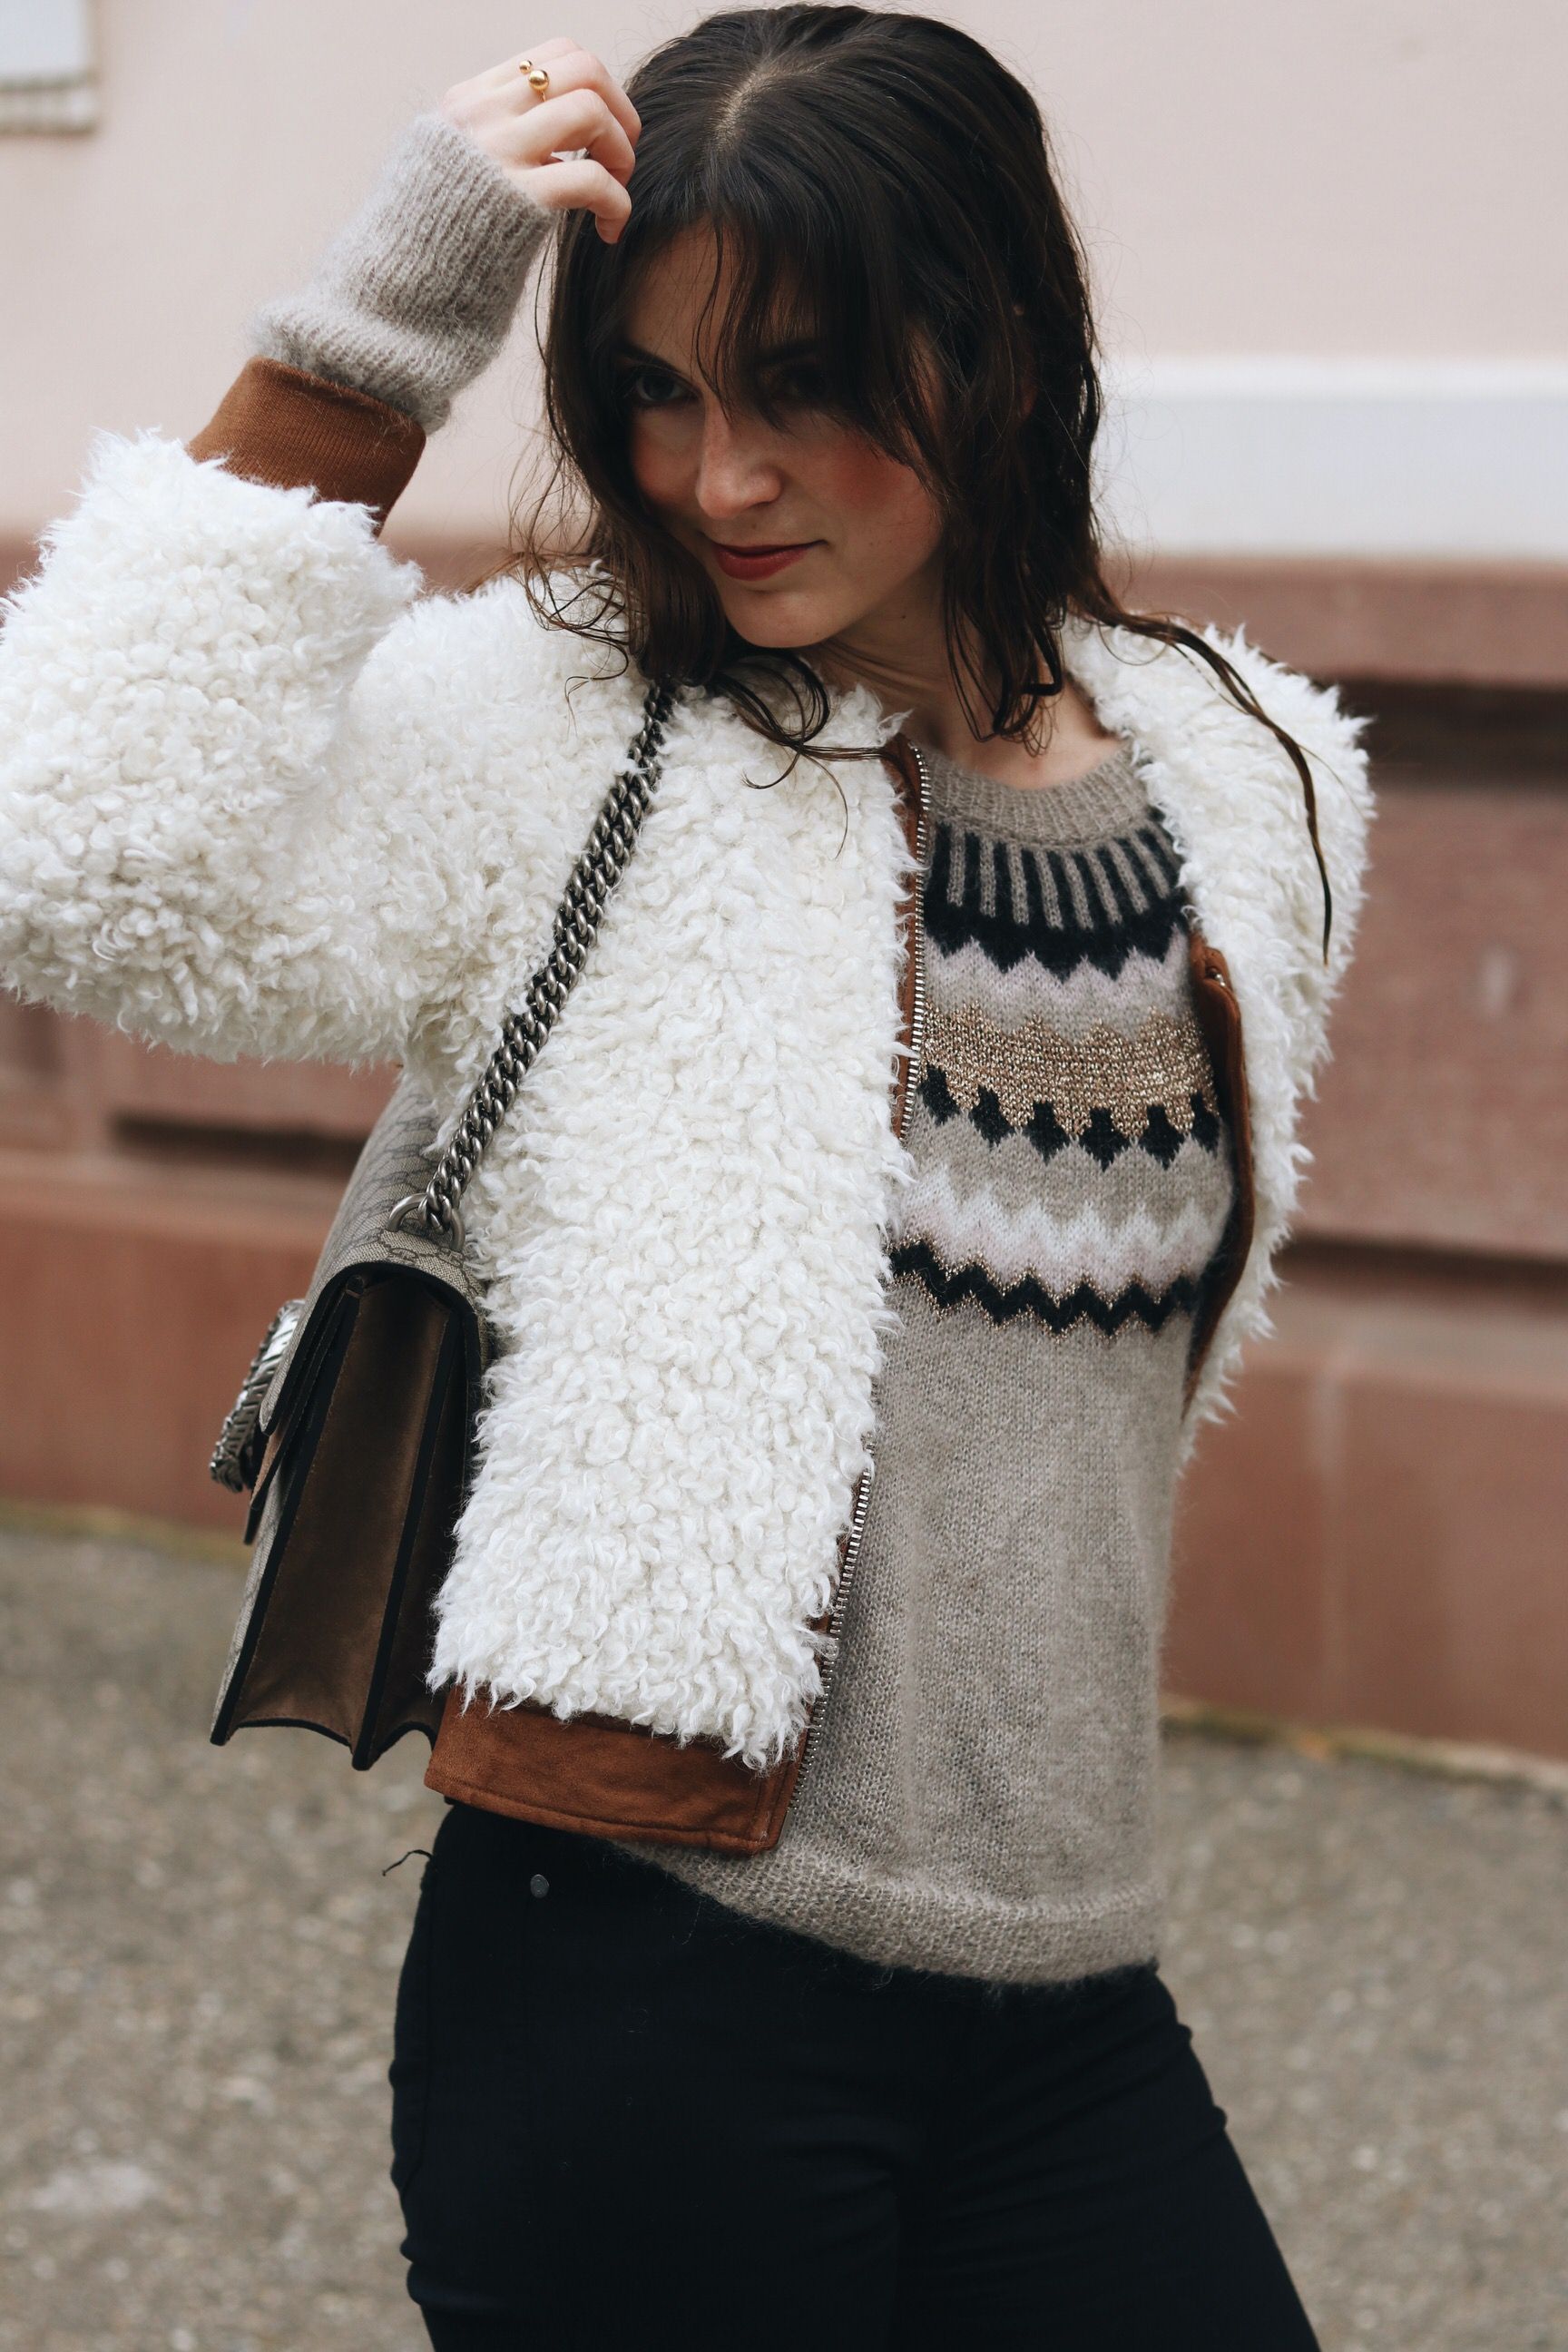 Norweger Pullover Damen kombinieren Fake Fur Felljacke Outfit Modeblog Streetstyle Instagram French Chic